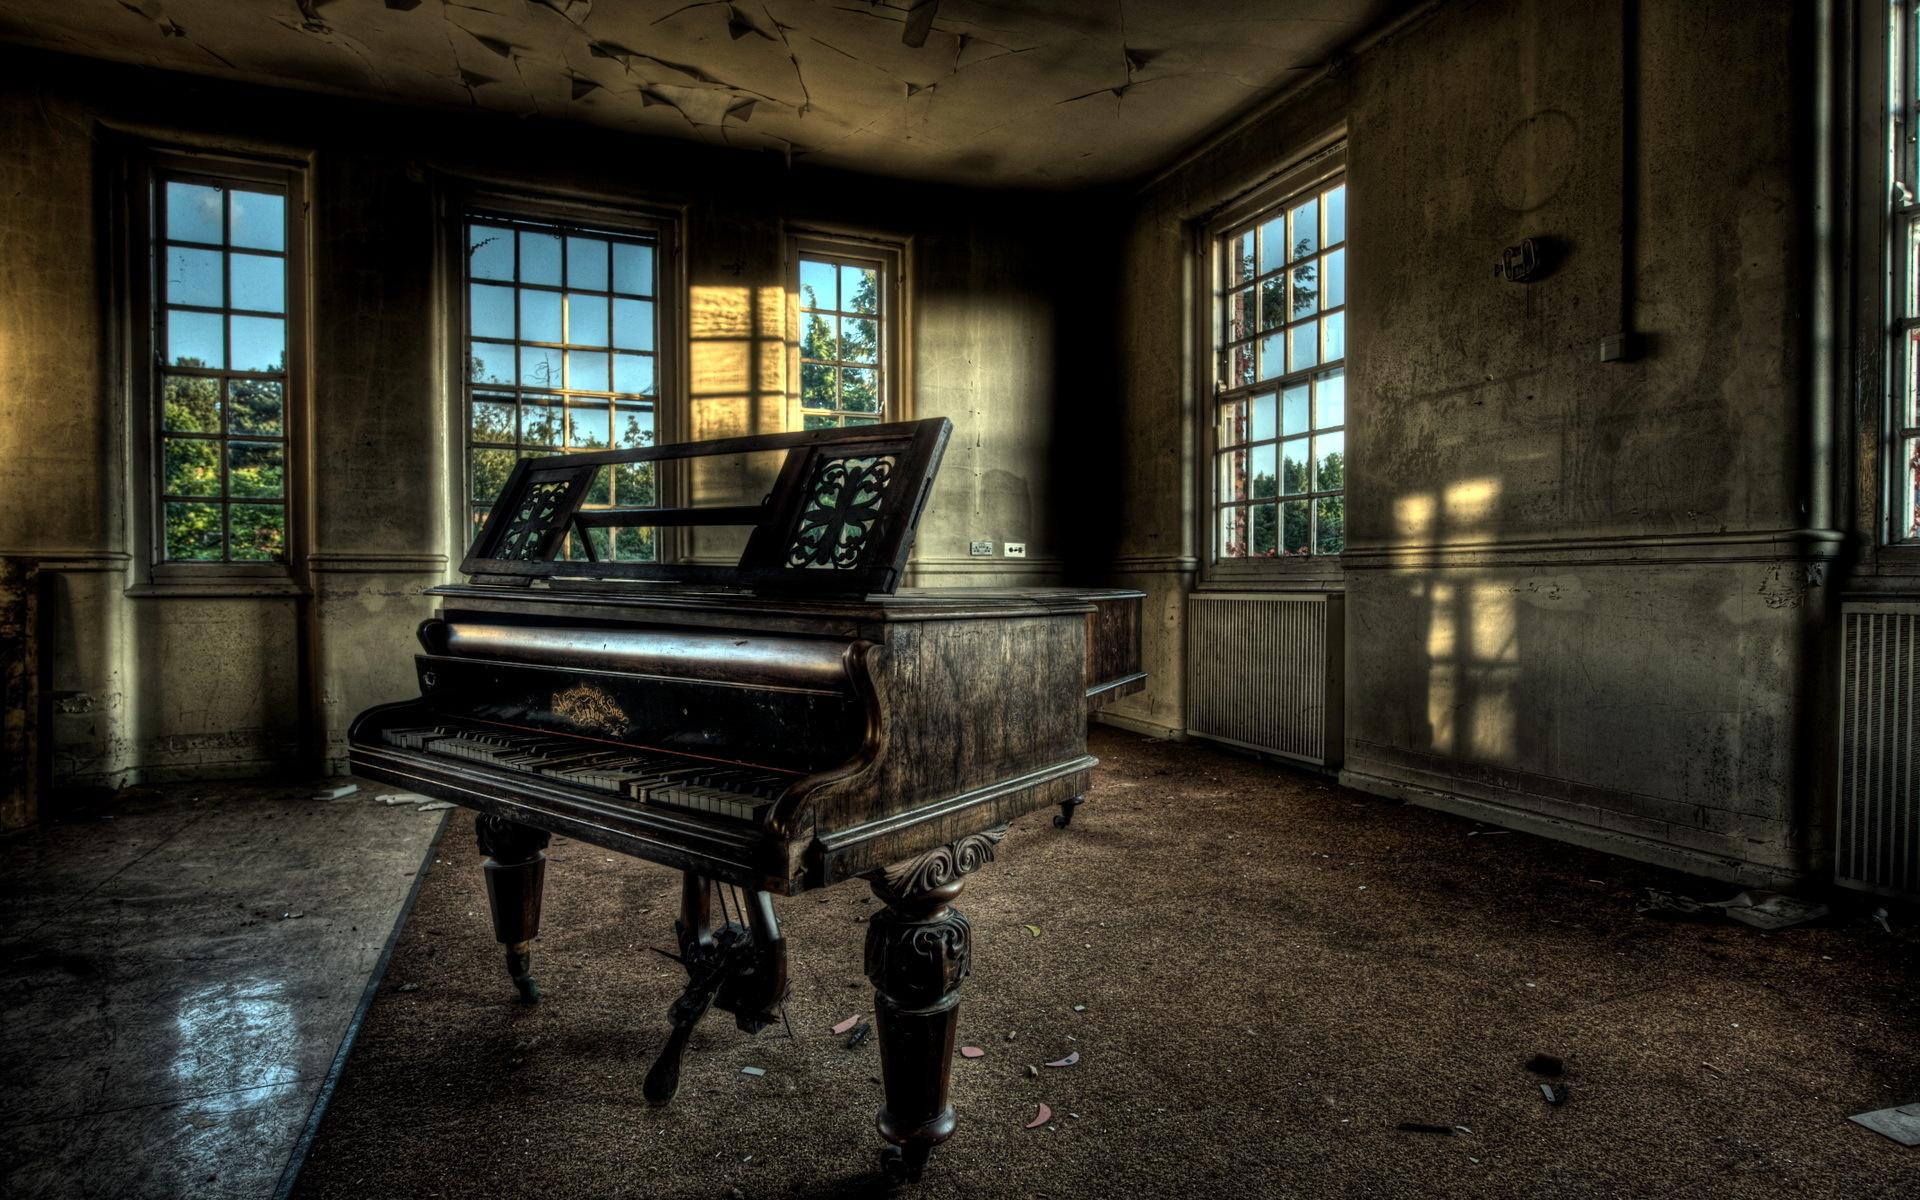 Grand piano wallpaper 1920x1200 172003 wallpaperup for Dark house music